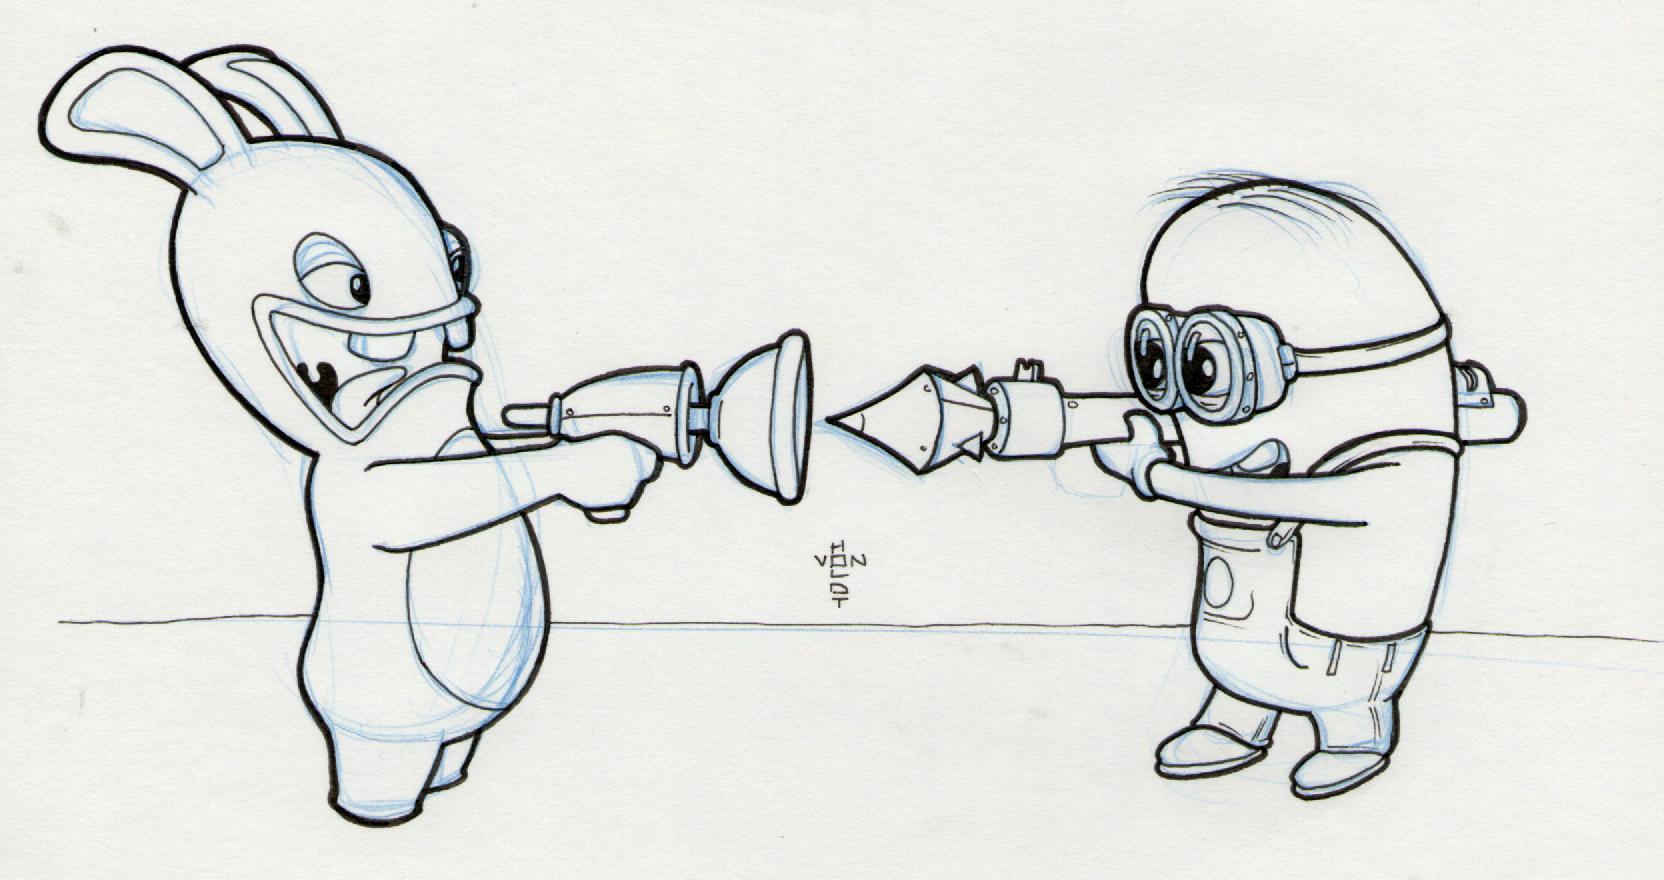 Drawn rabbid doodle Doodle Day vs Rabbids –